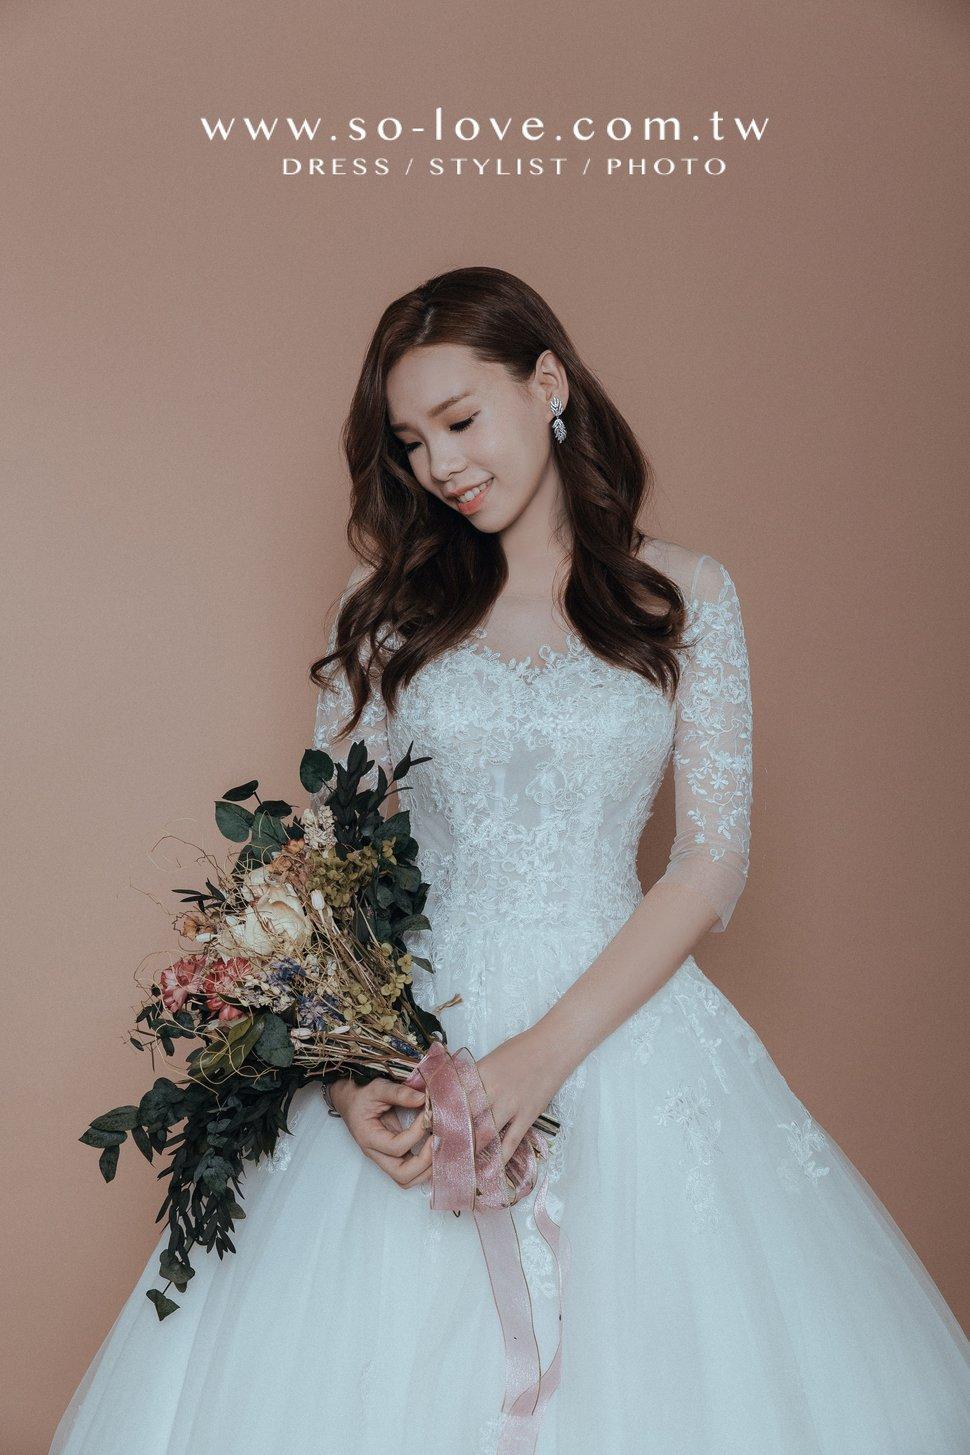 YCG2B6540 - So.Love Wedding 樂樂蕾絲《結婚吧》